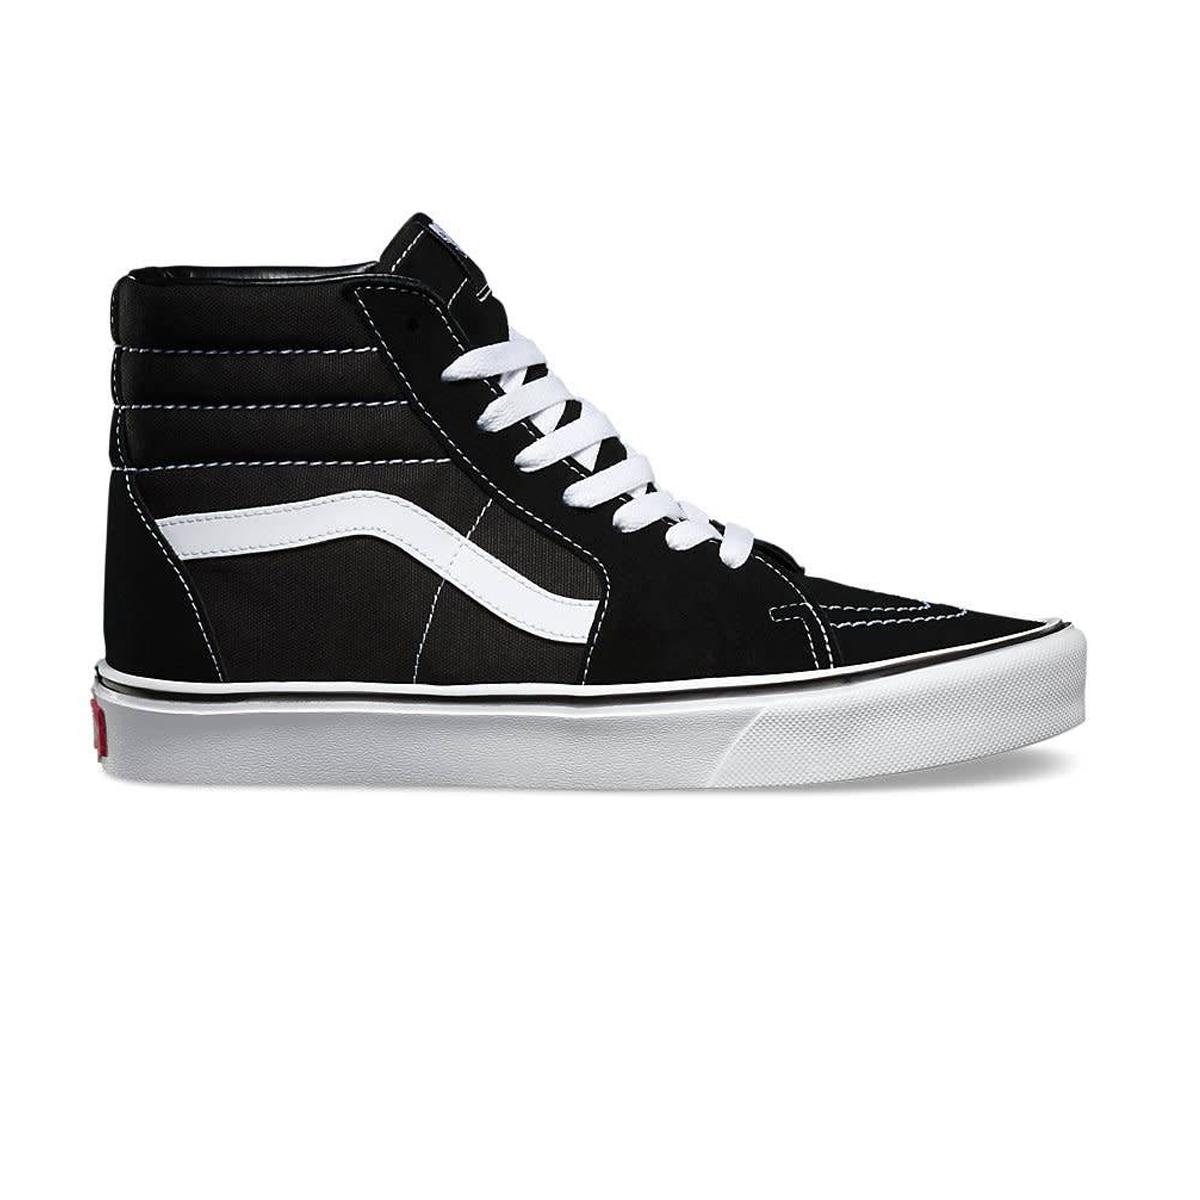 Vans Sk8 Hi Black/Black/White